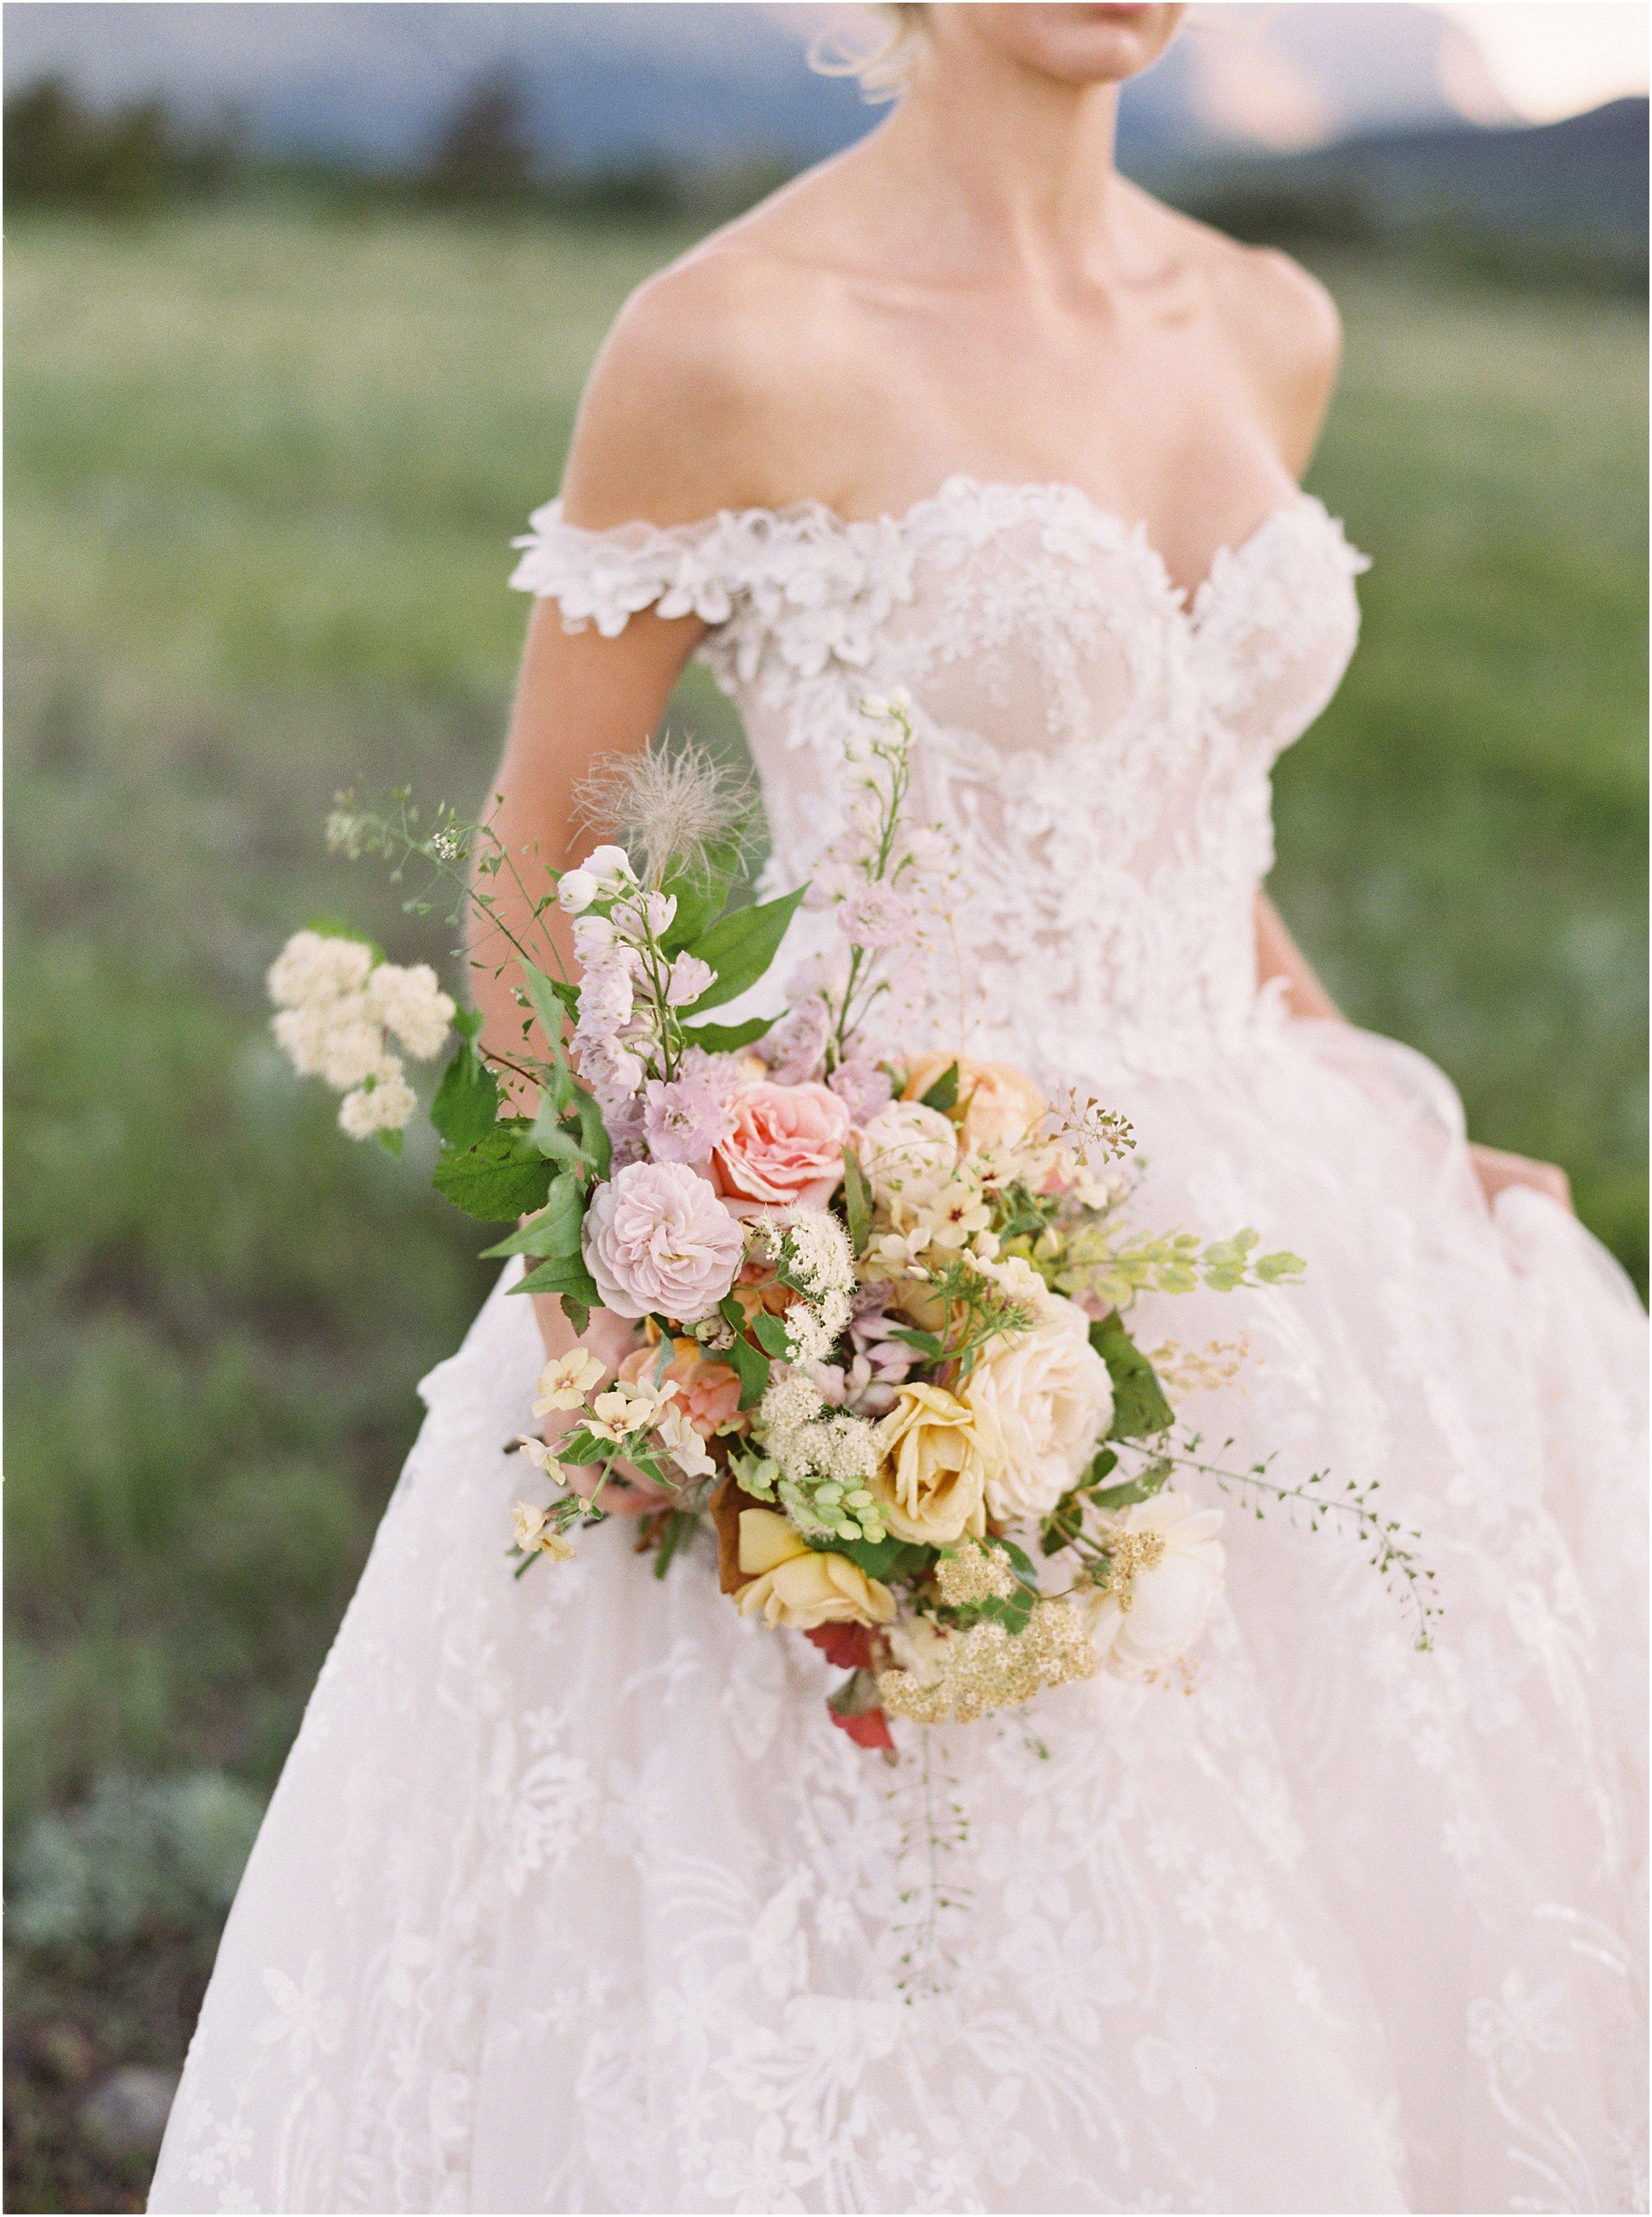 ©Jeremiah & Rachel Photographywww.jeremiahandrachel.comStyling & Florals: Kelly Lenardhttp://www.kellylenard.comWedding Gown: Galia Lahavhttps://www.galialahav.com/